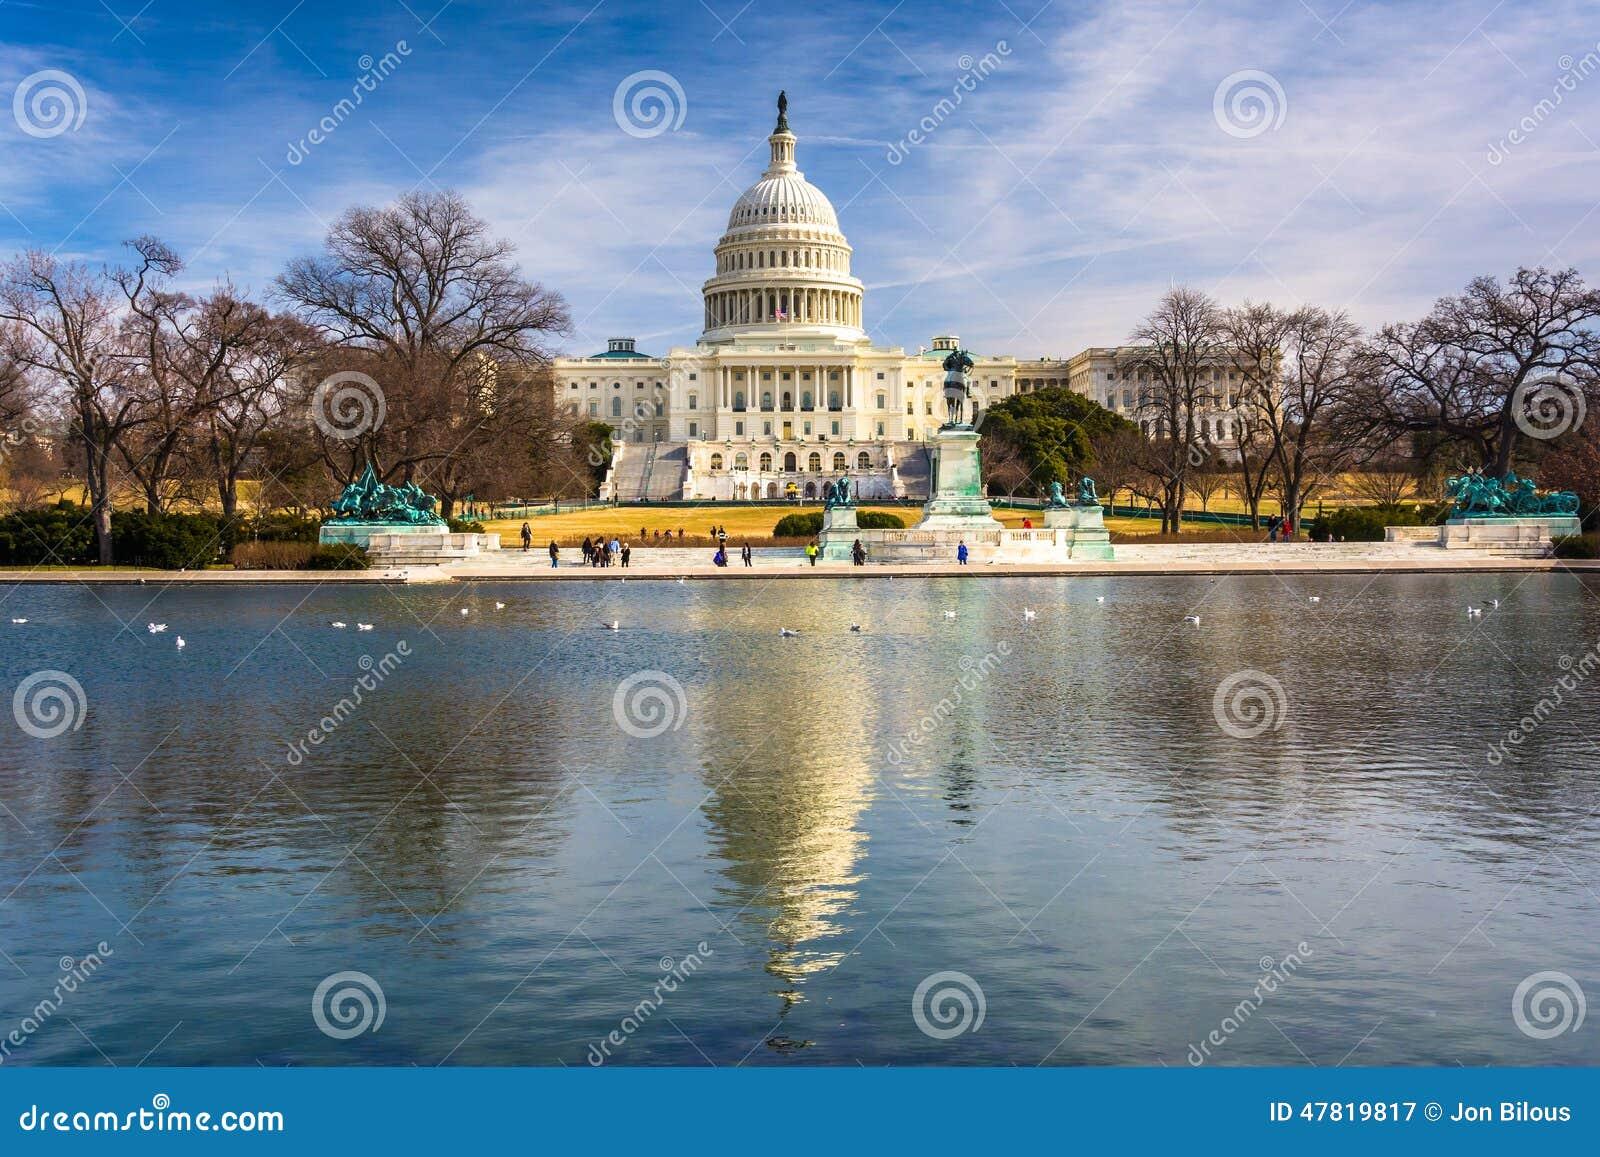 Download 美国国会大厦和反射水池在华盛顿特区, 库存图片. 图片 包括有 政府, 地标, 云彩, 历史记录, beautifuler - 47819817